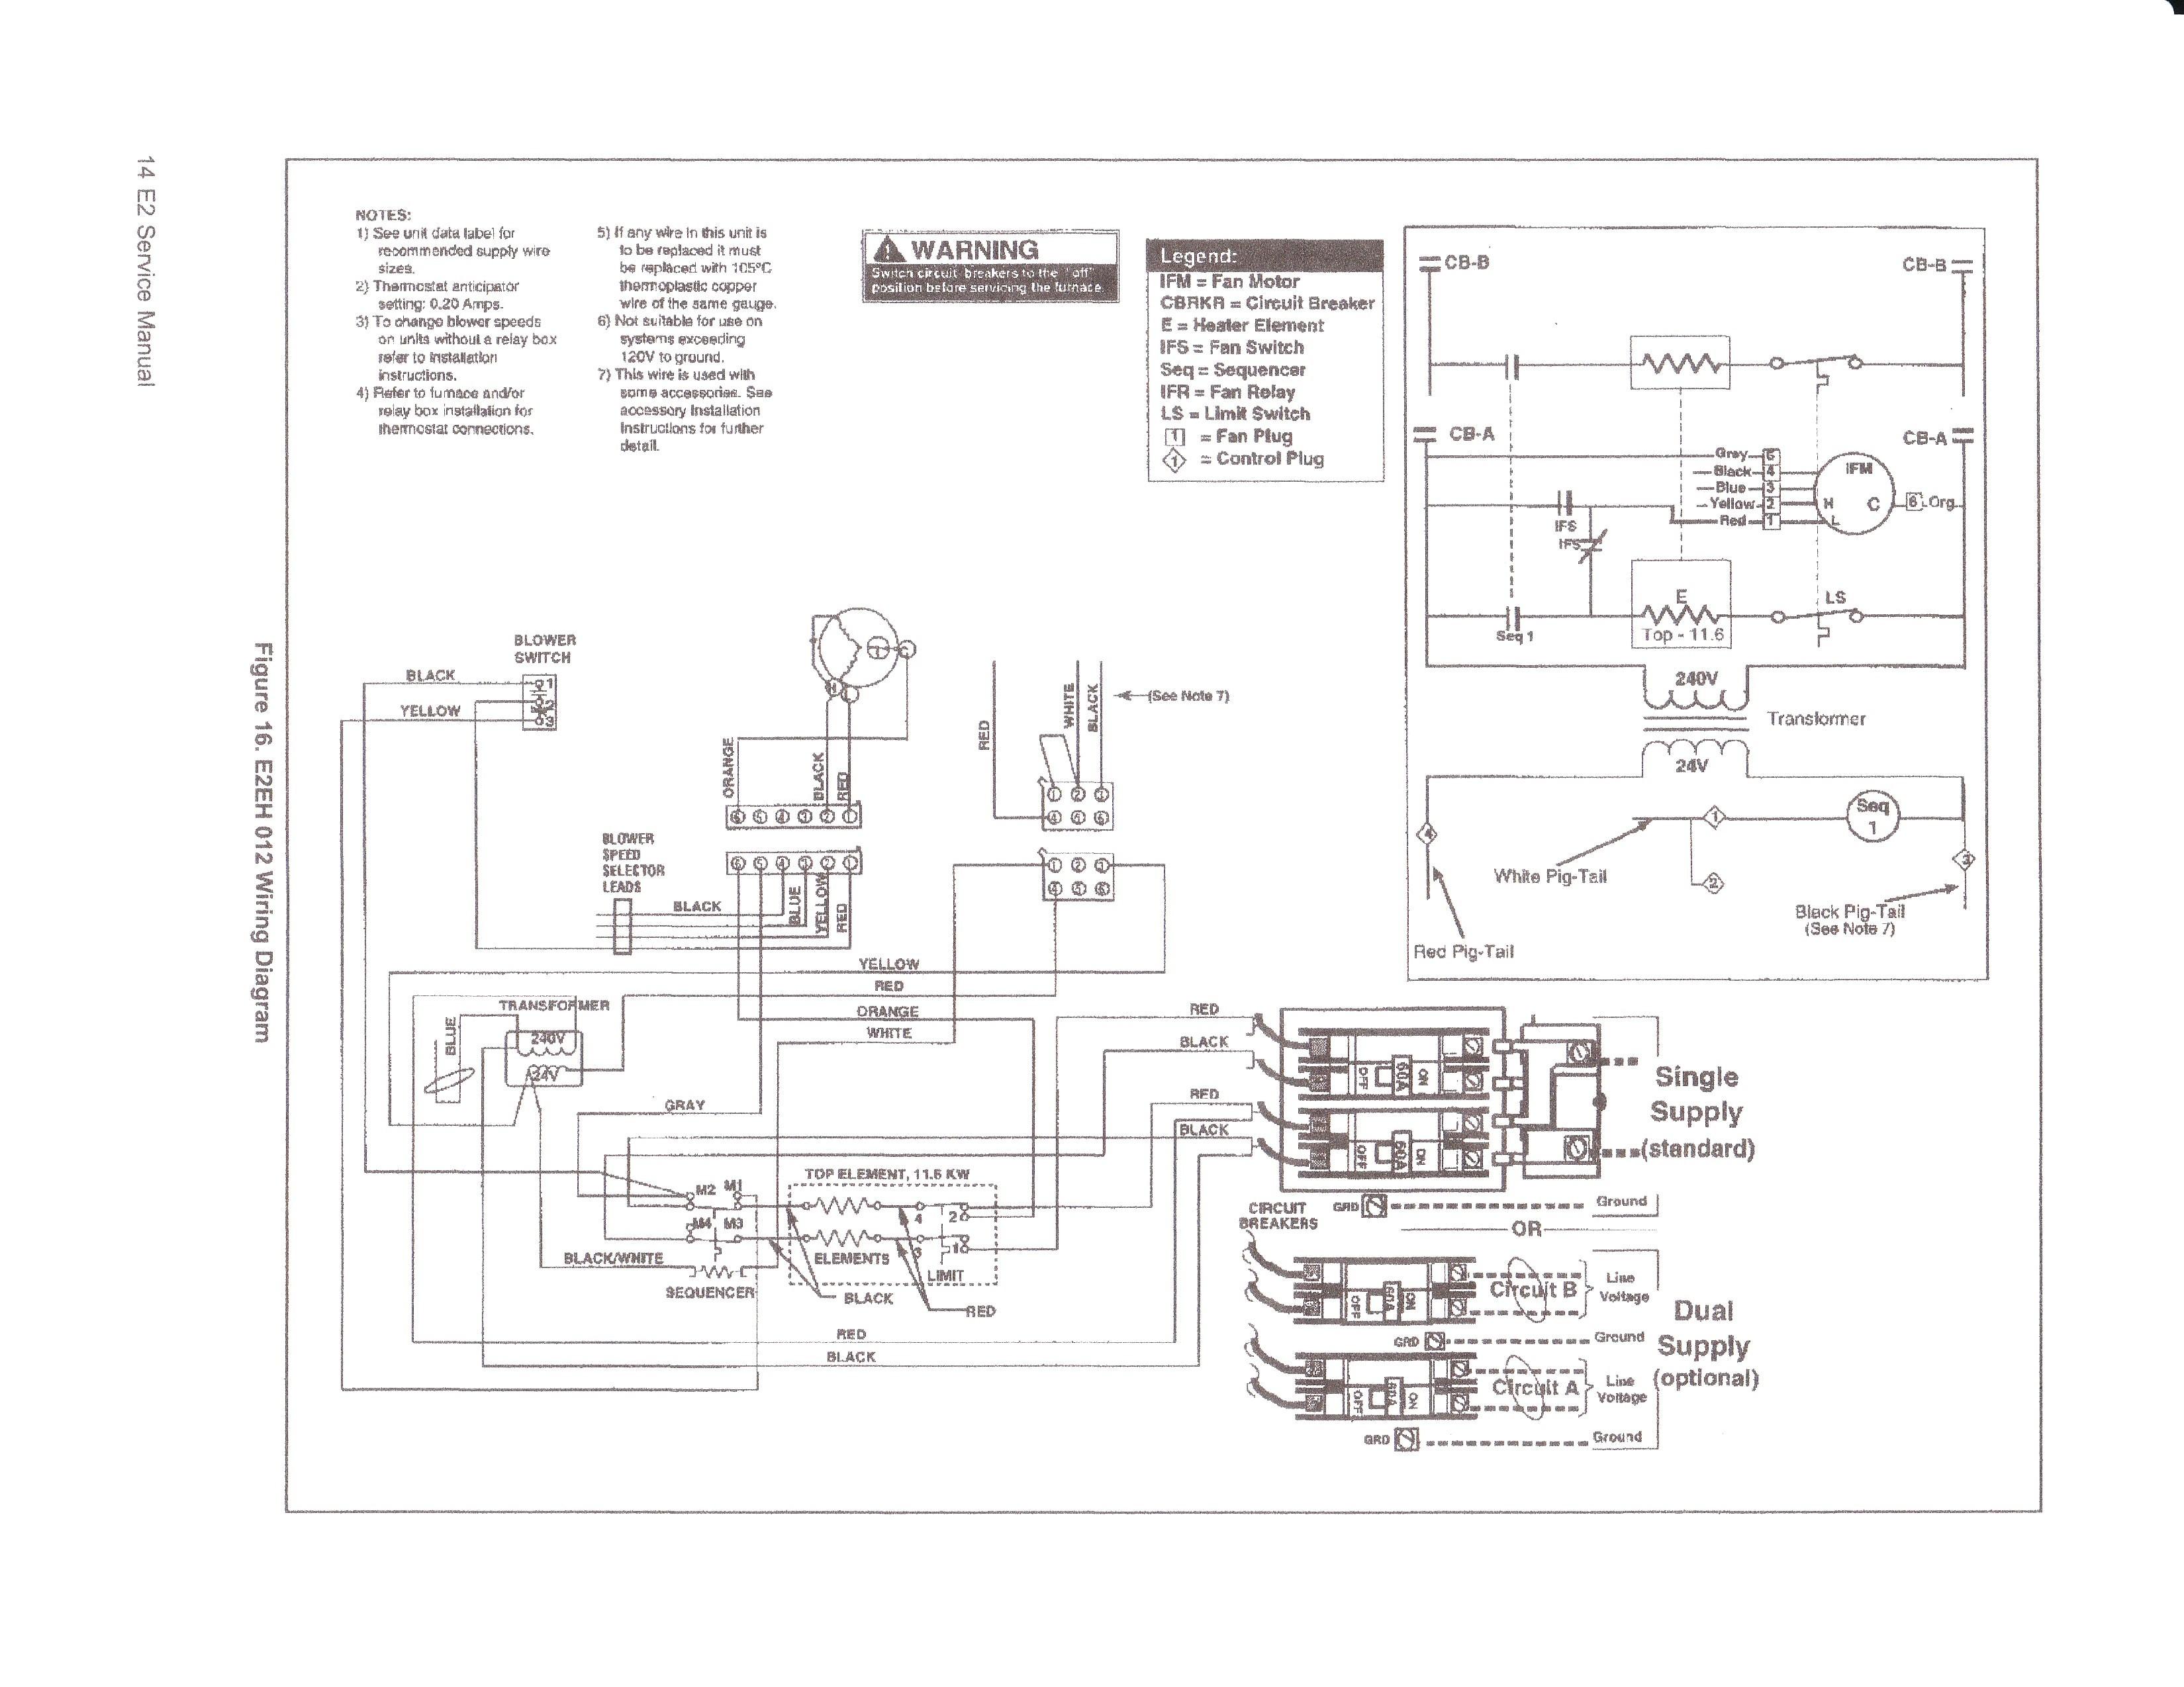 Electric Heat Furnace Wiring Diagram Fresh Intertherm Electric Furnace Wiring Diagram Wiring Diagram